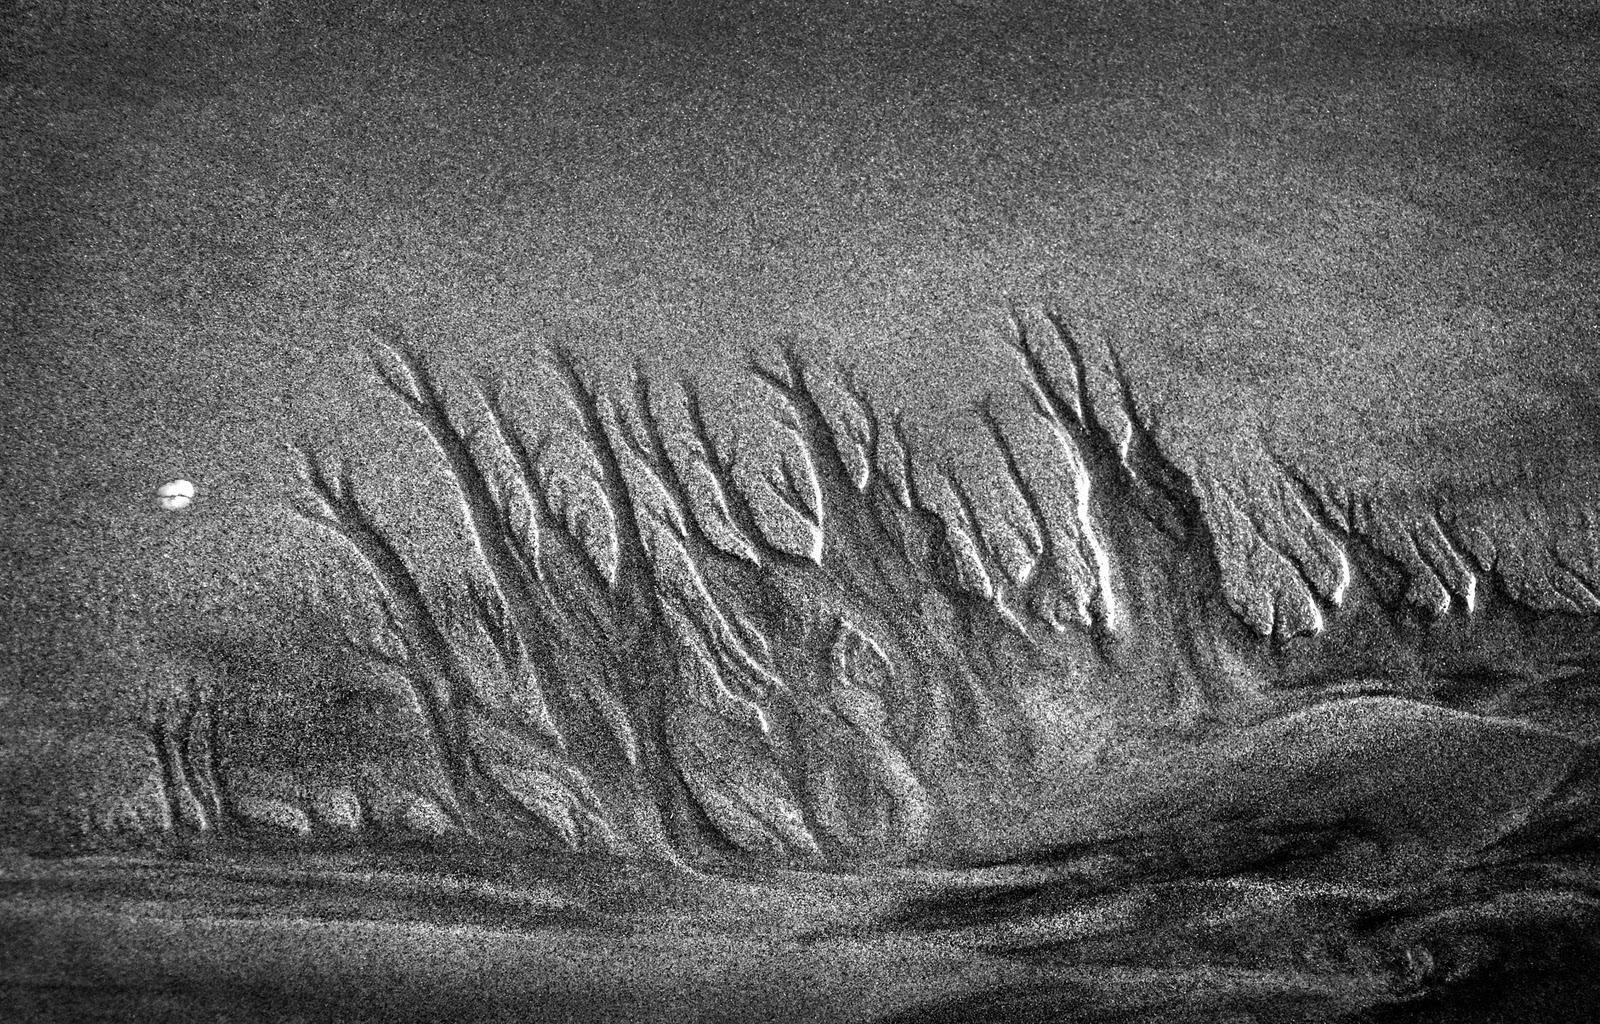 sandforestagainUNSHRP.jpg